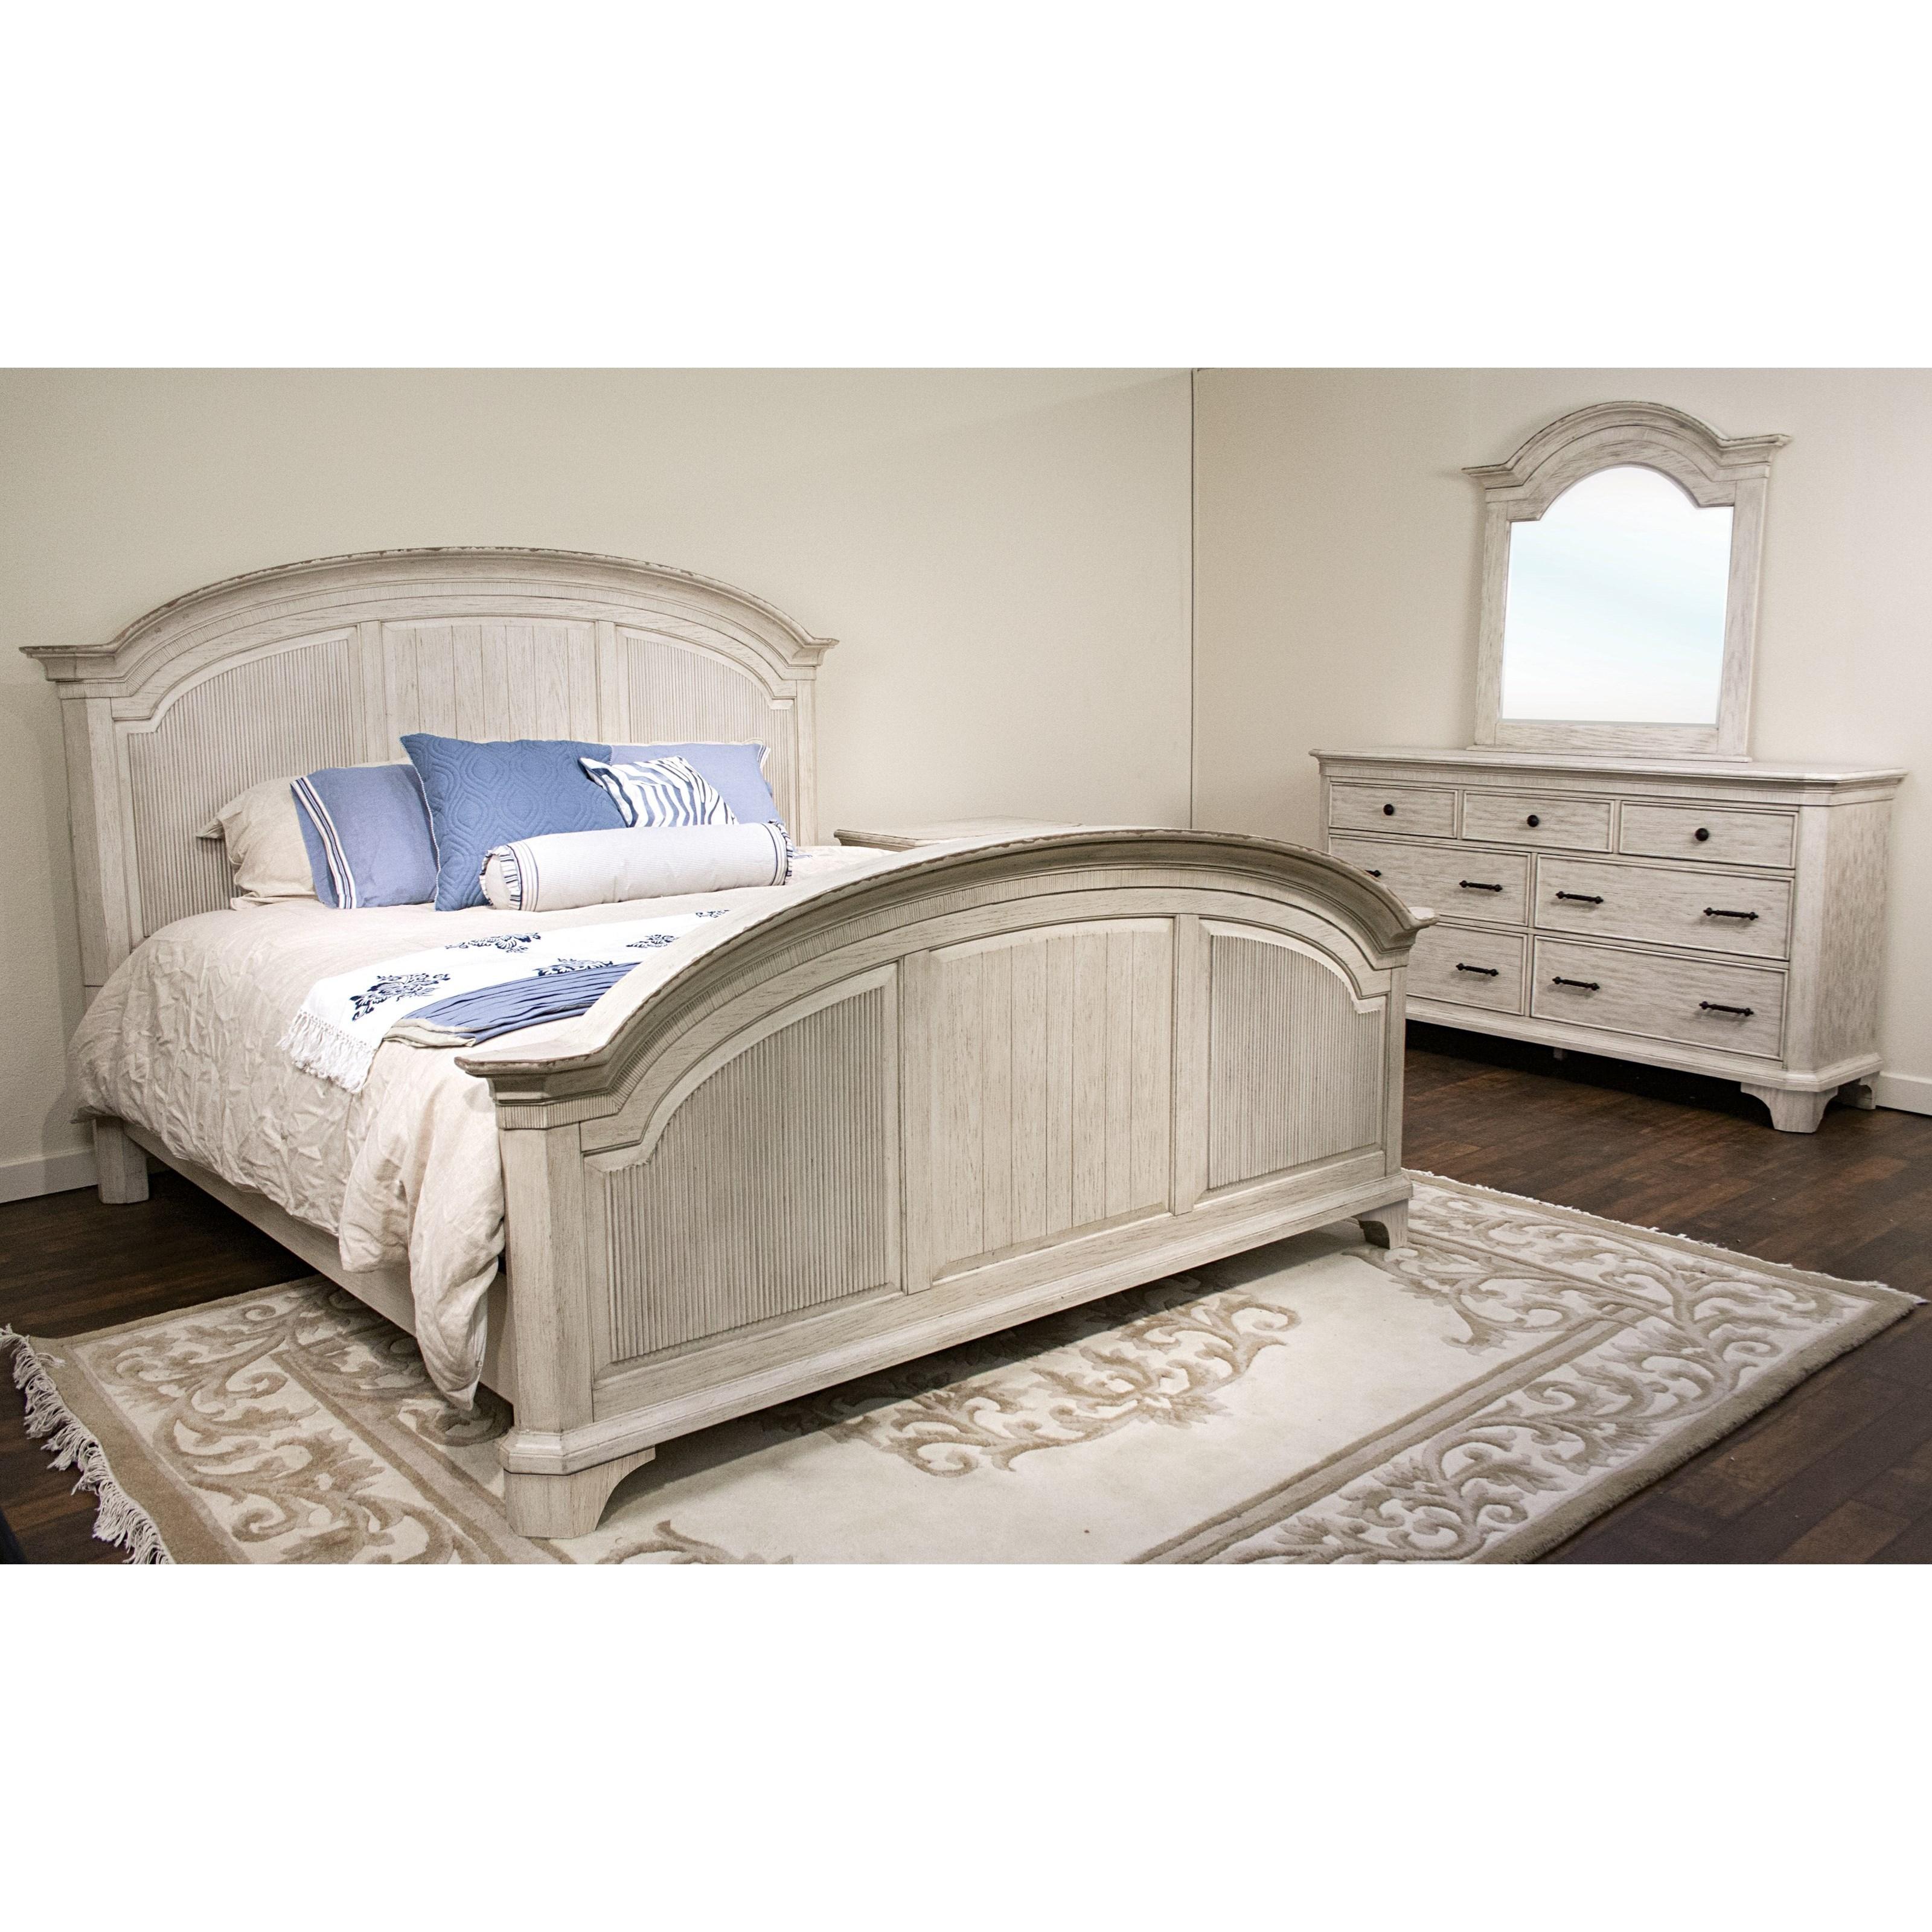 Riverside Furniture Aberdeen King Bedroom Group 3 - Item Number: 212 K Bedroom Group 3